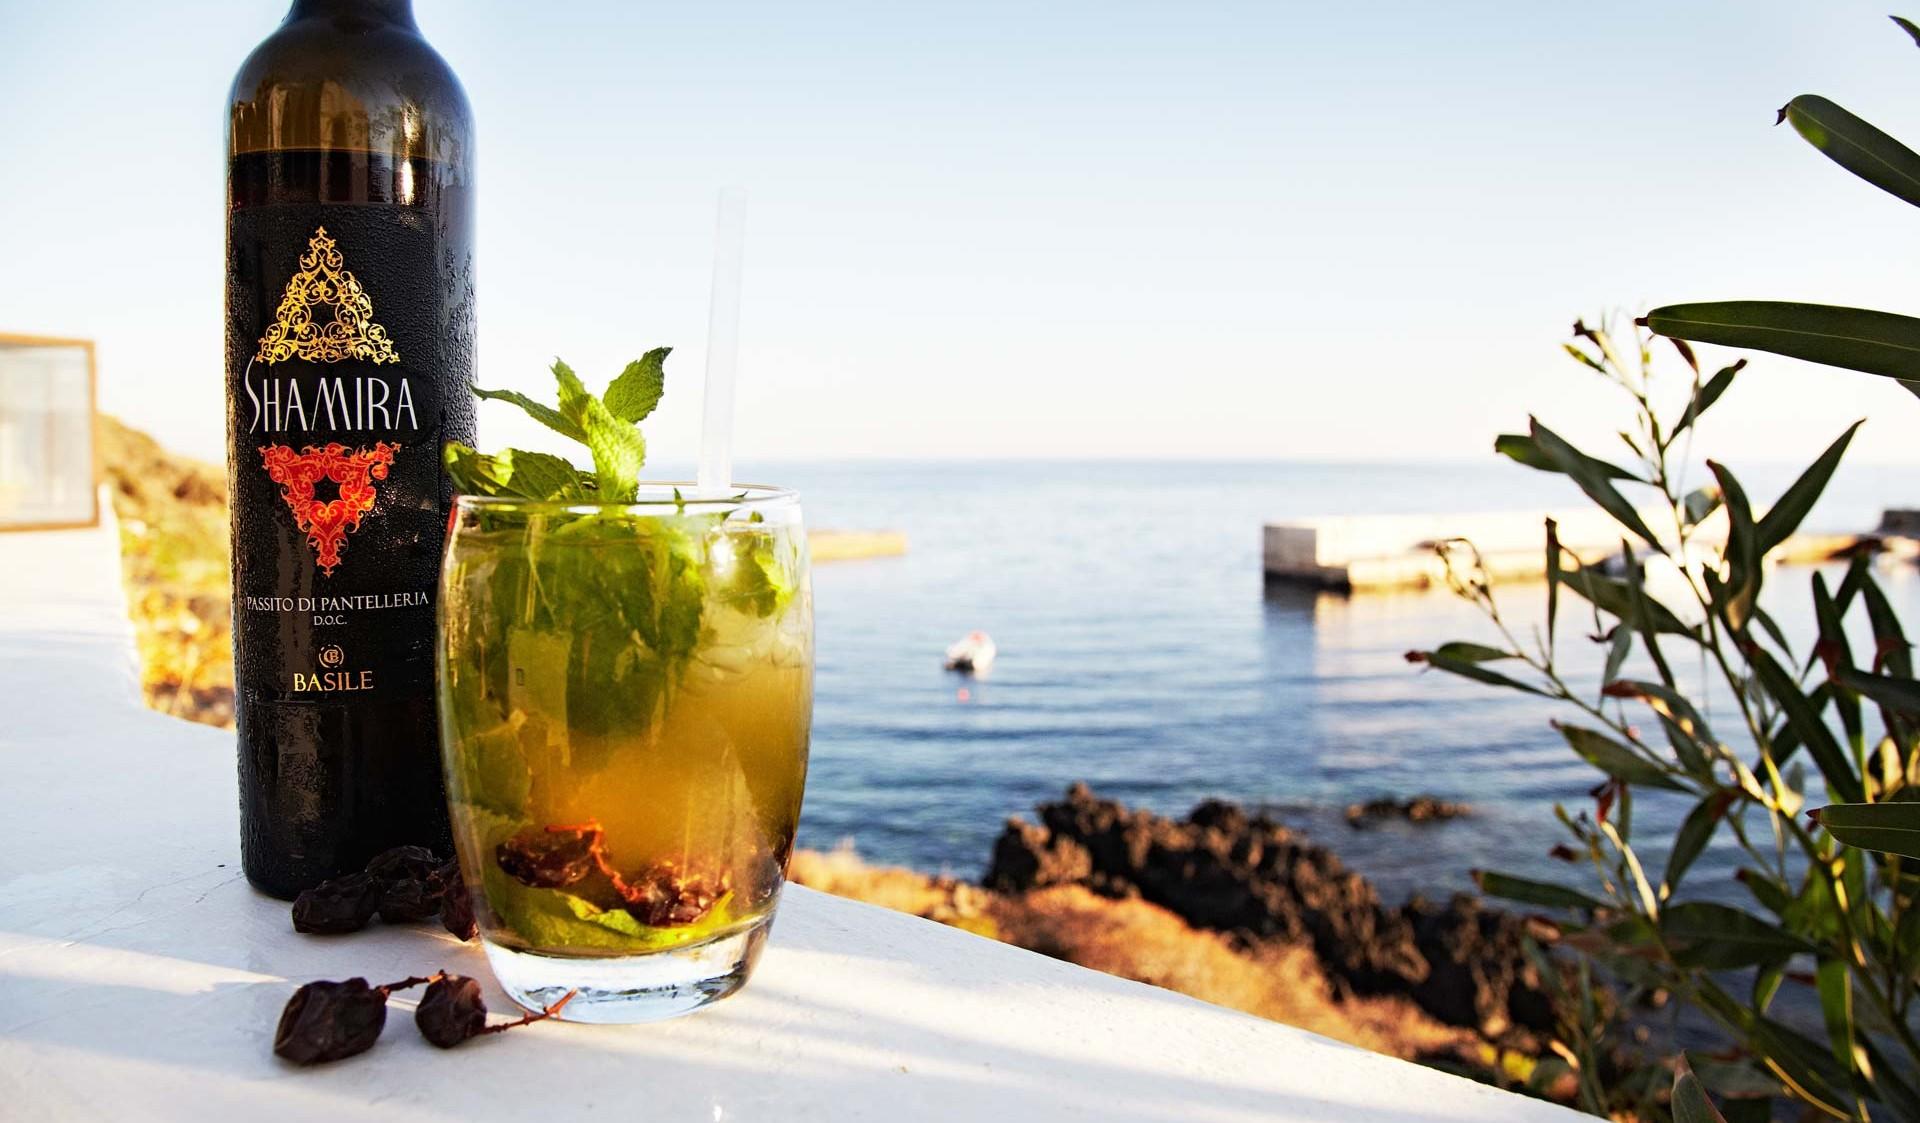 Altamarea_Drink_Passito_landscap-e1438708286213